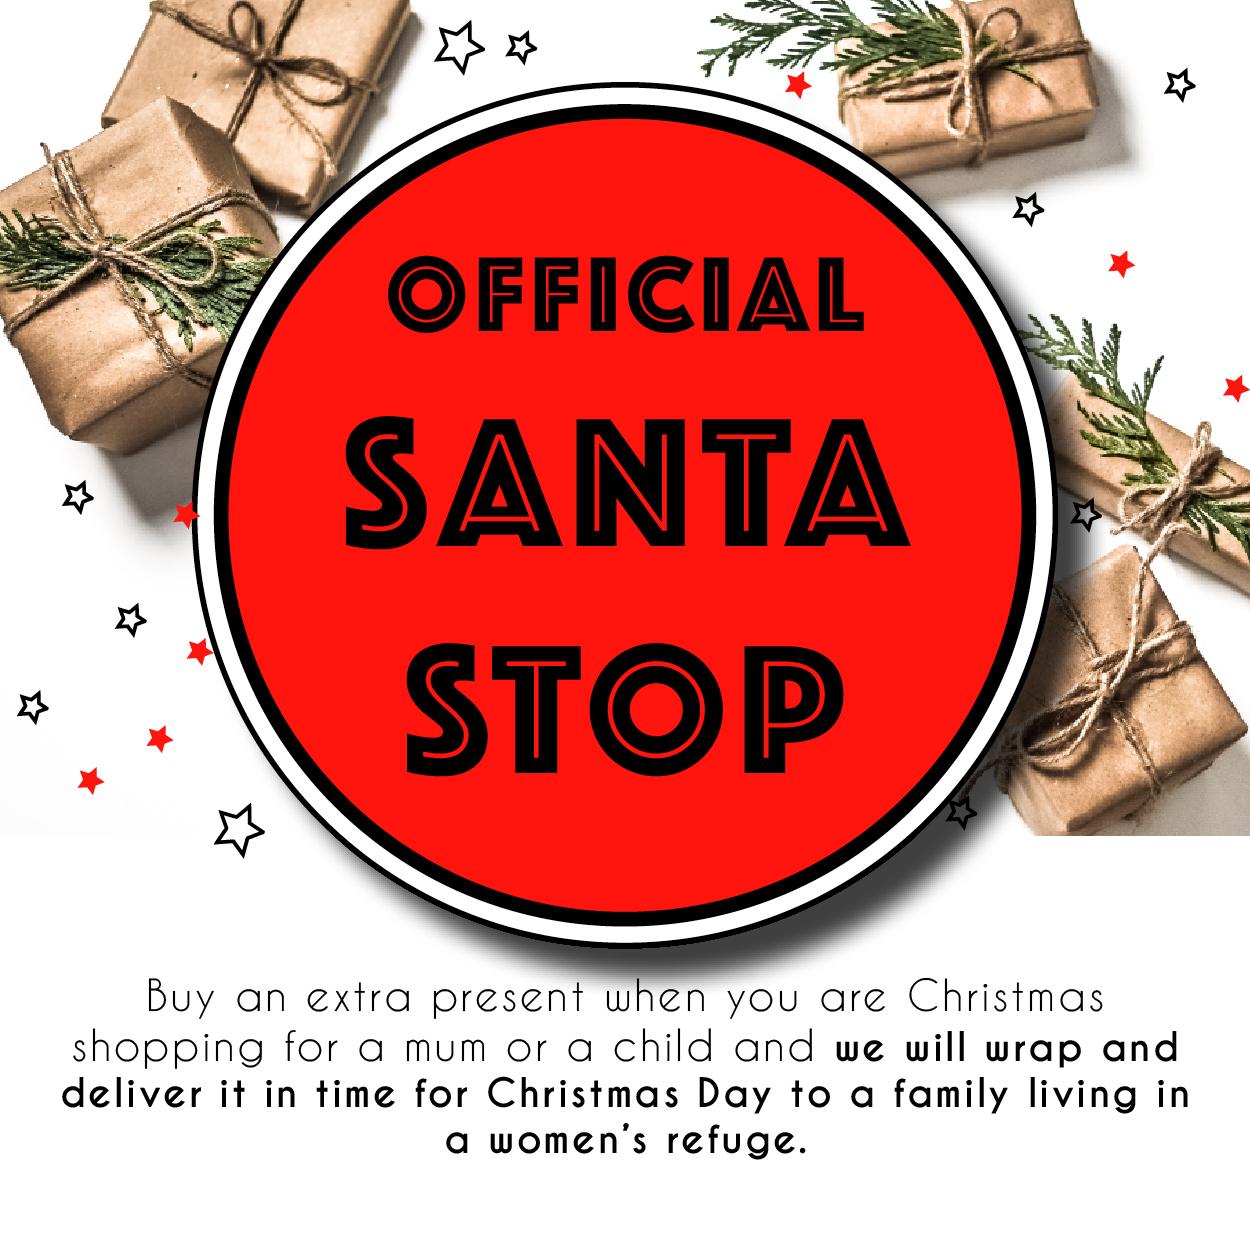 Official_Santa_Stop_Square.jpg